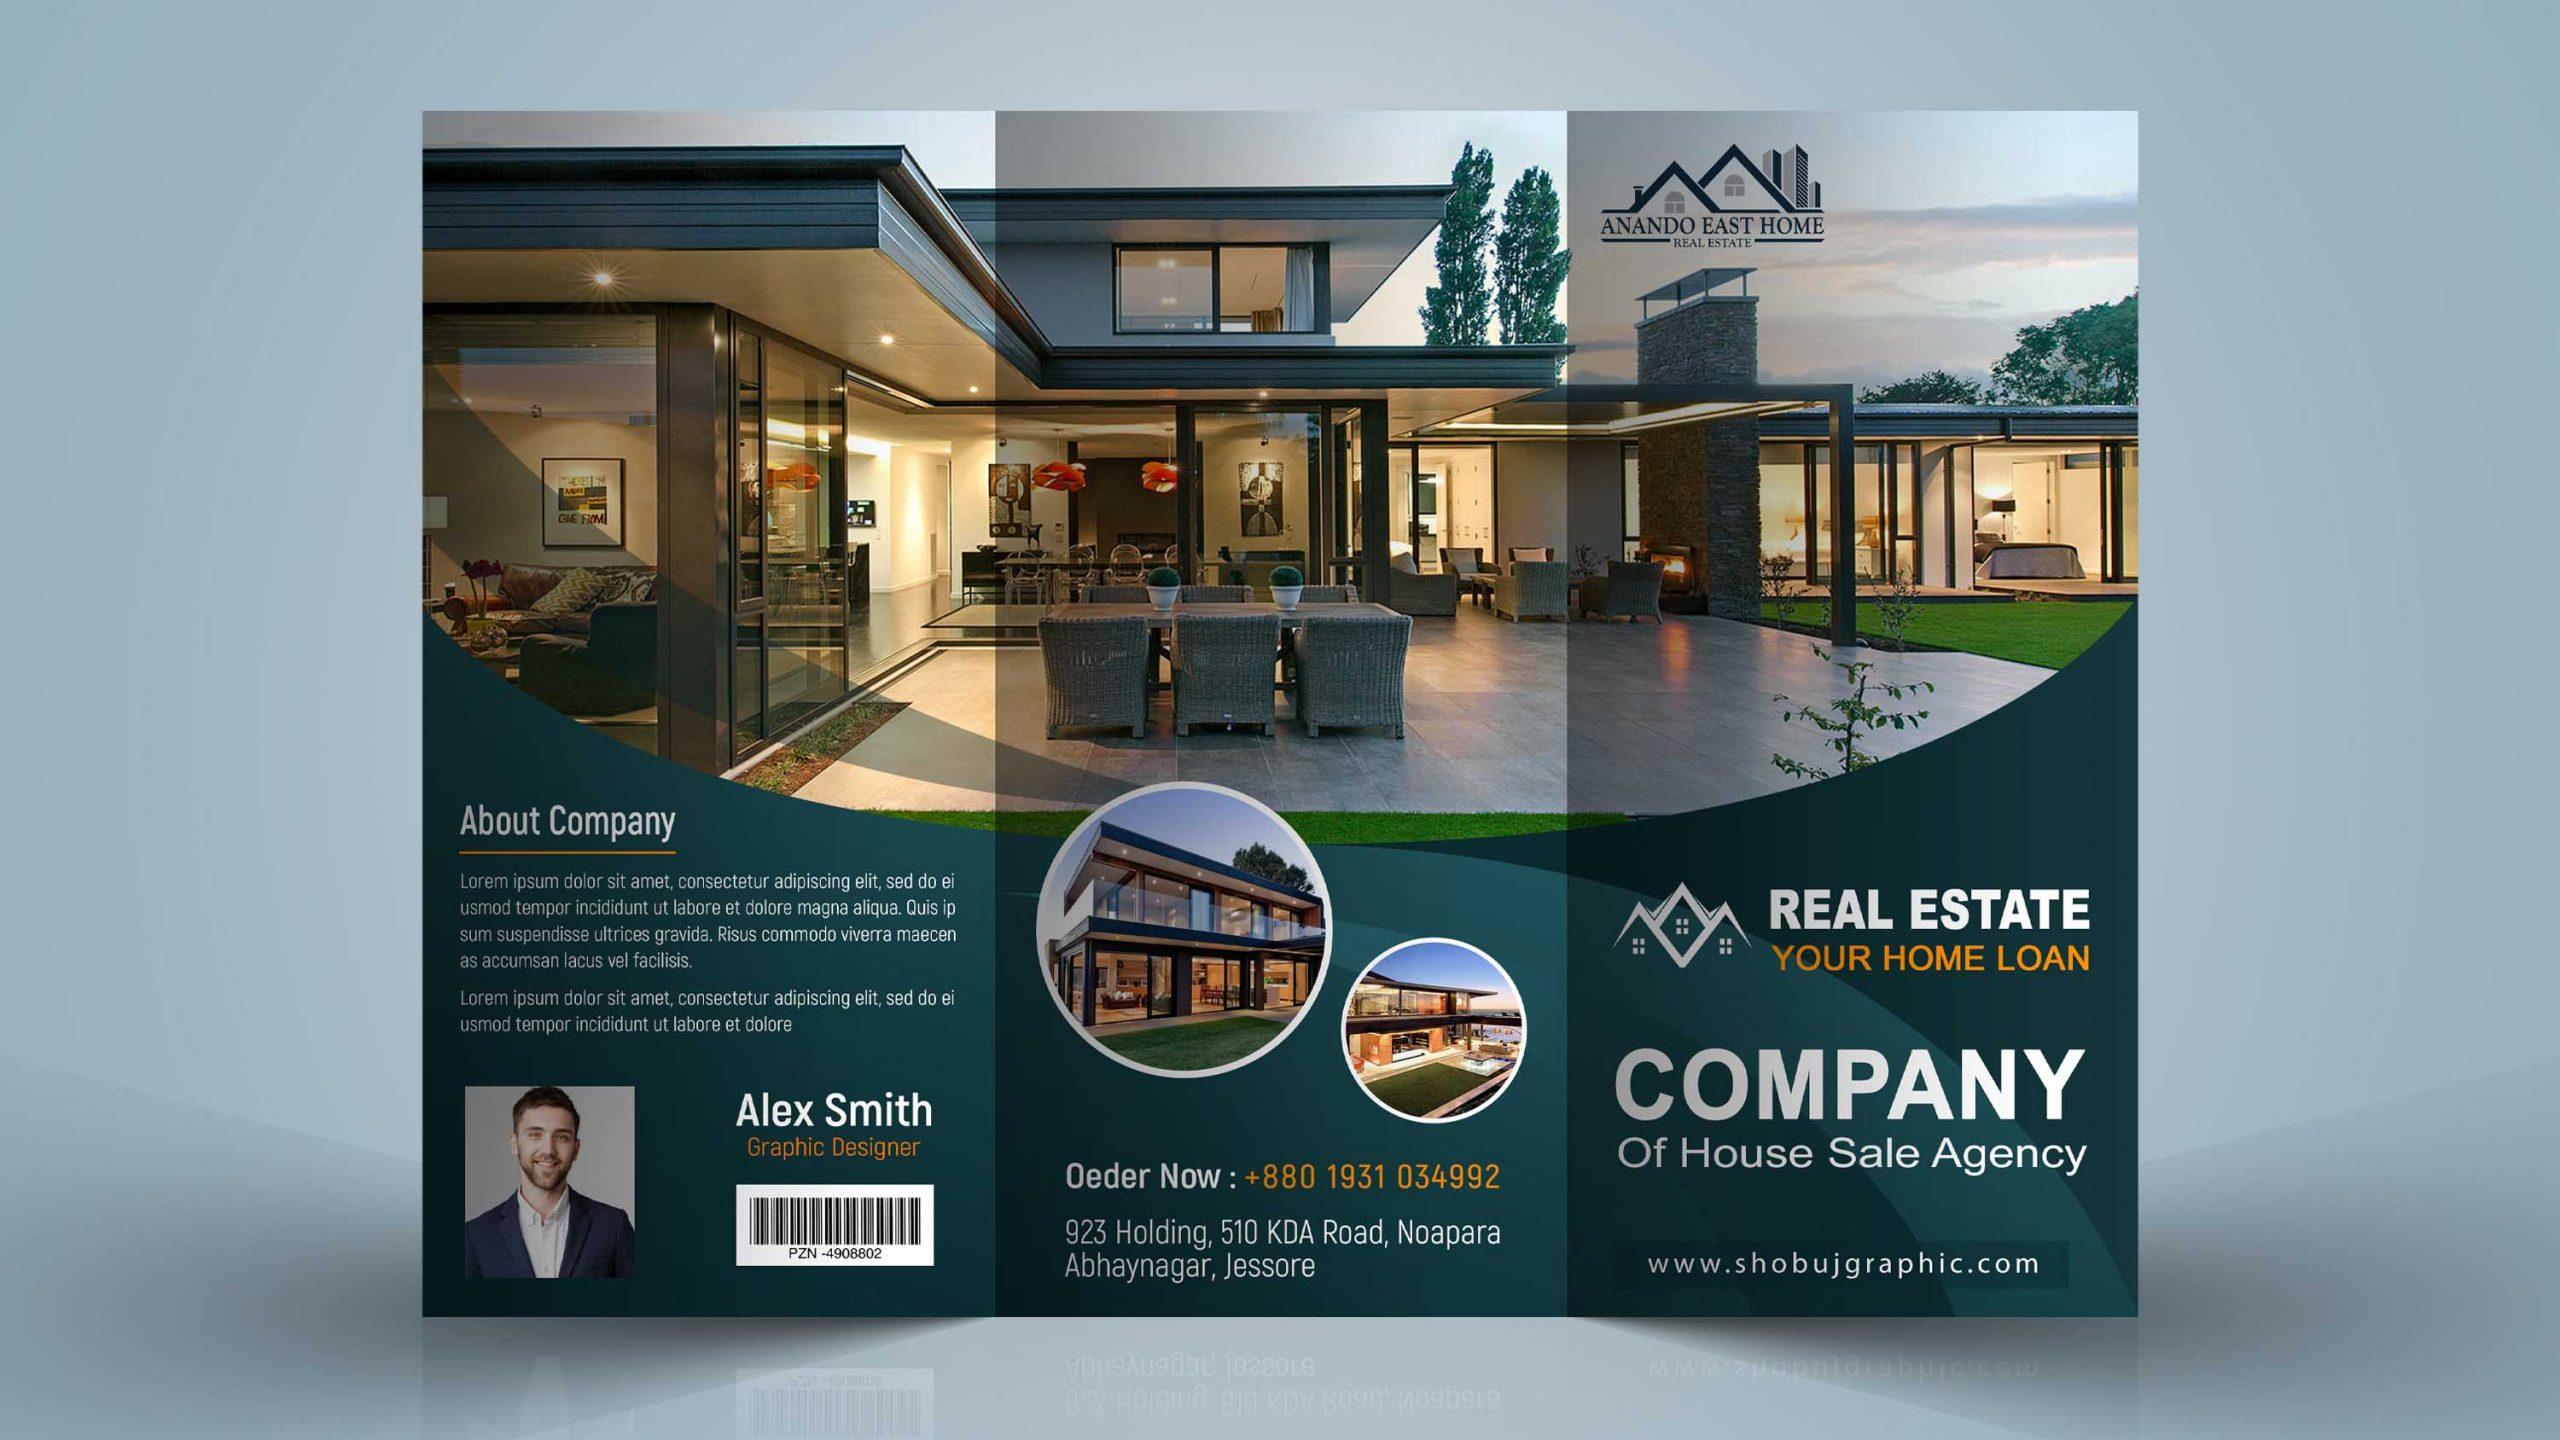 Real Estate Brochure Design Template in Photoshop